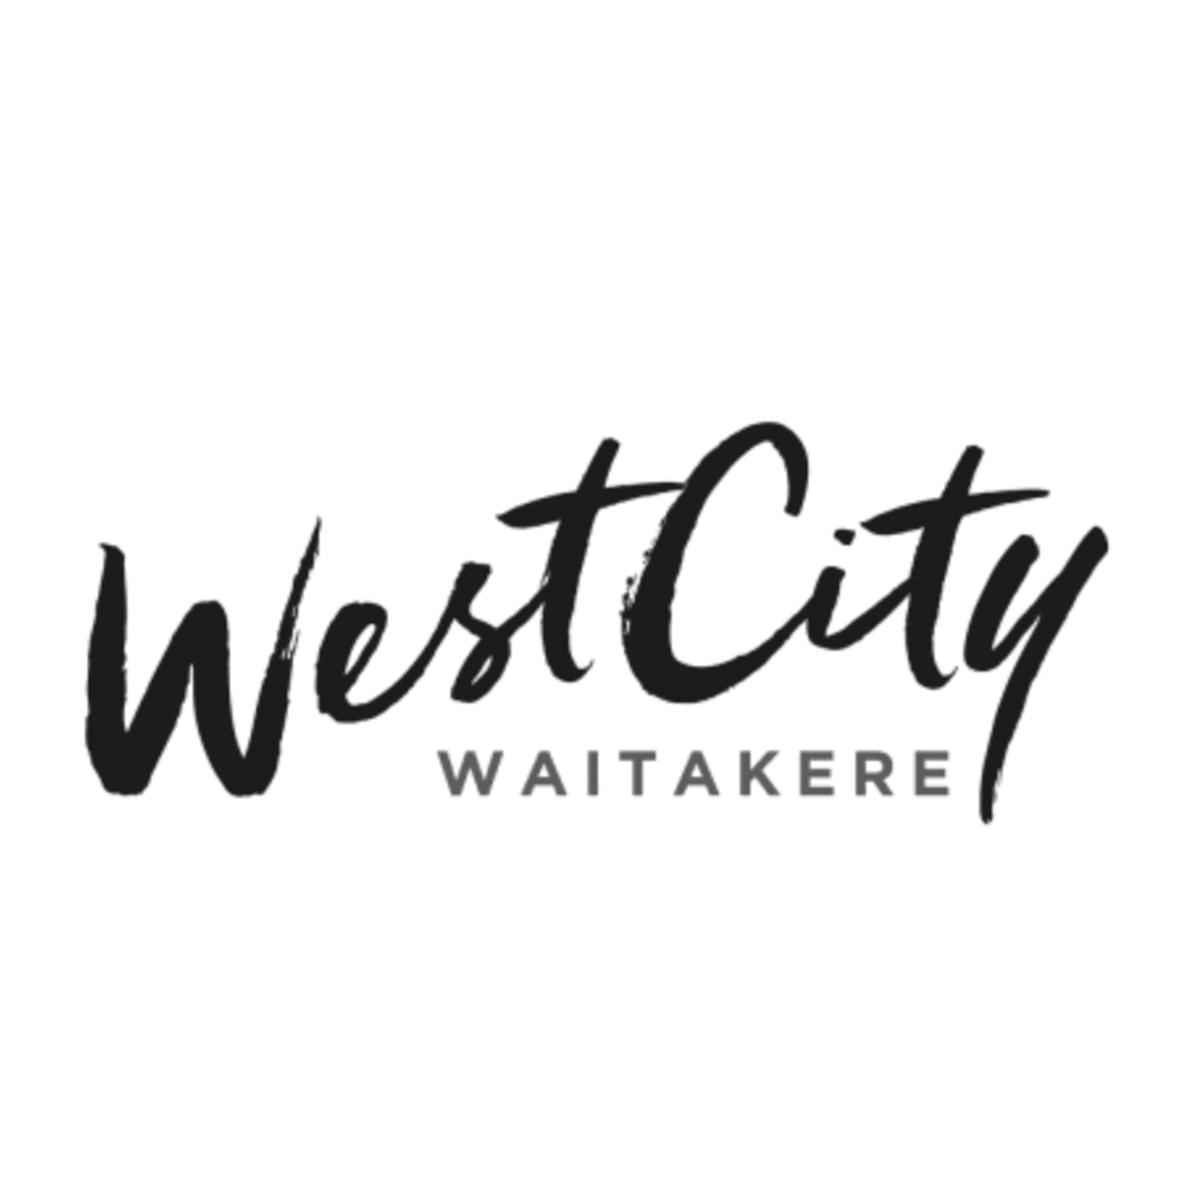 Westcity.jpg